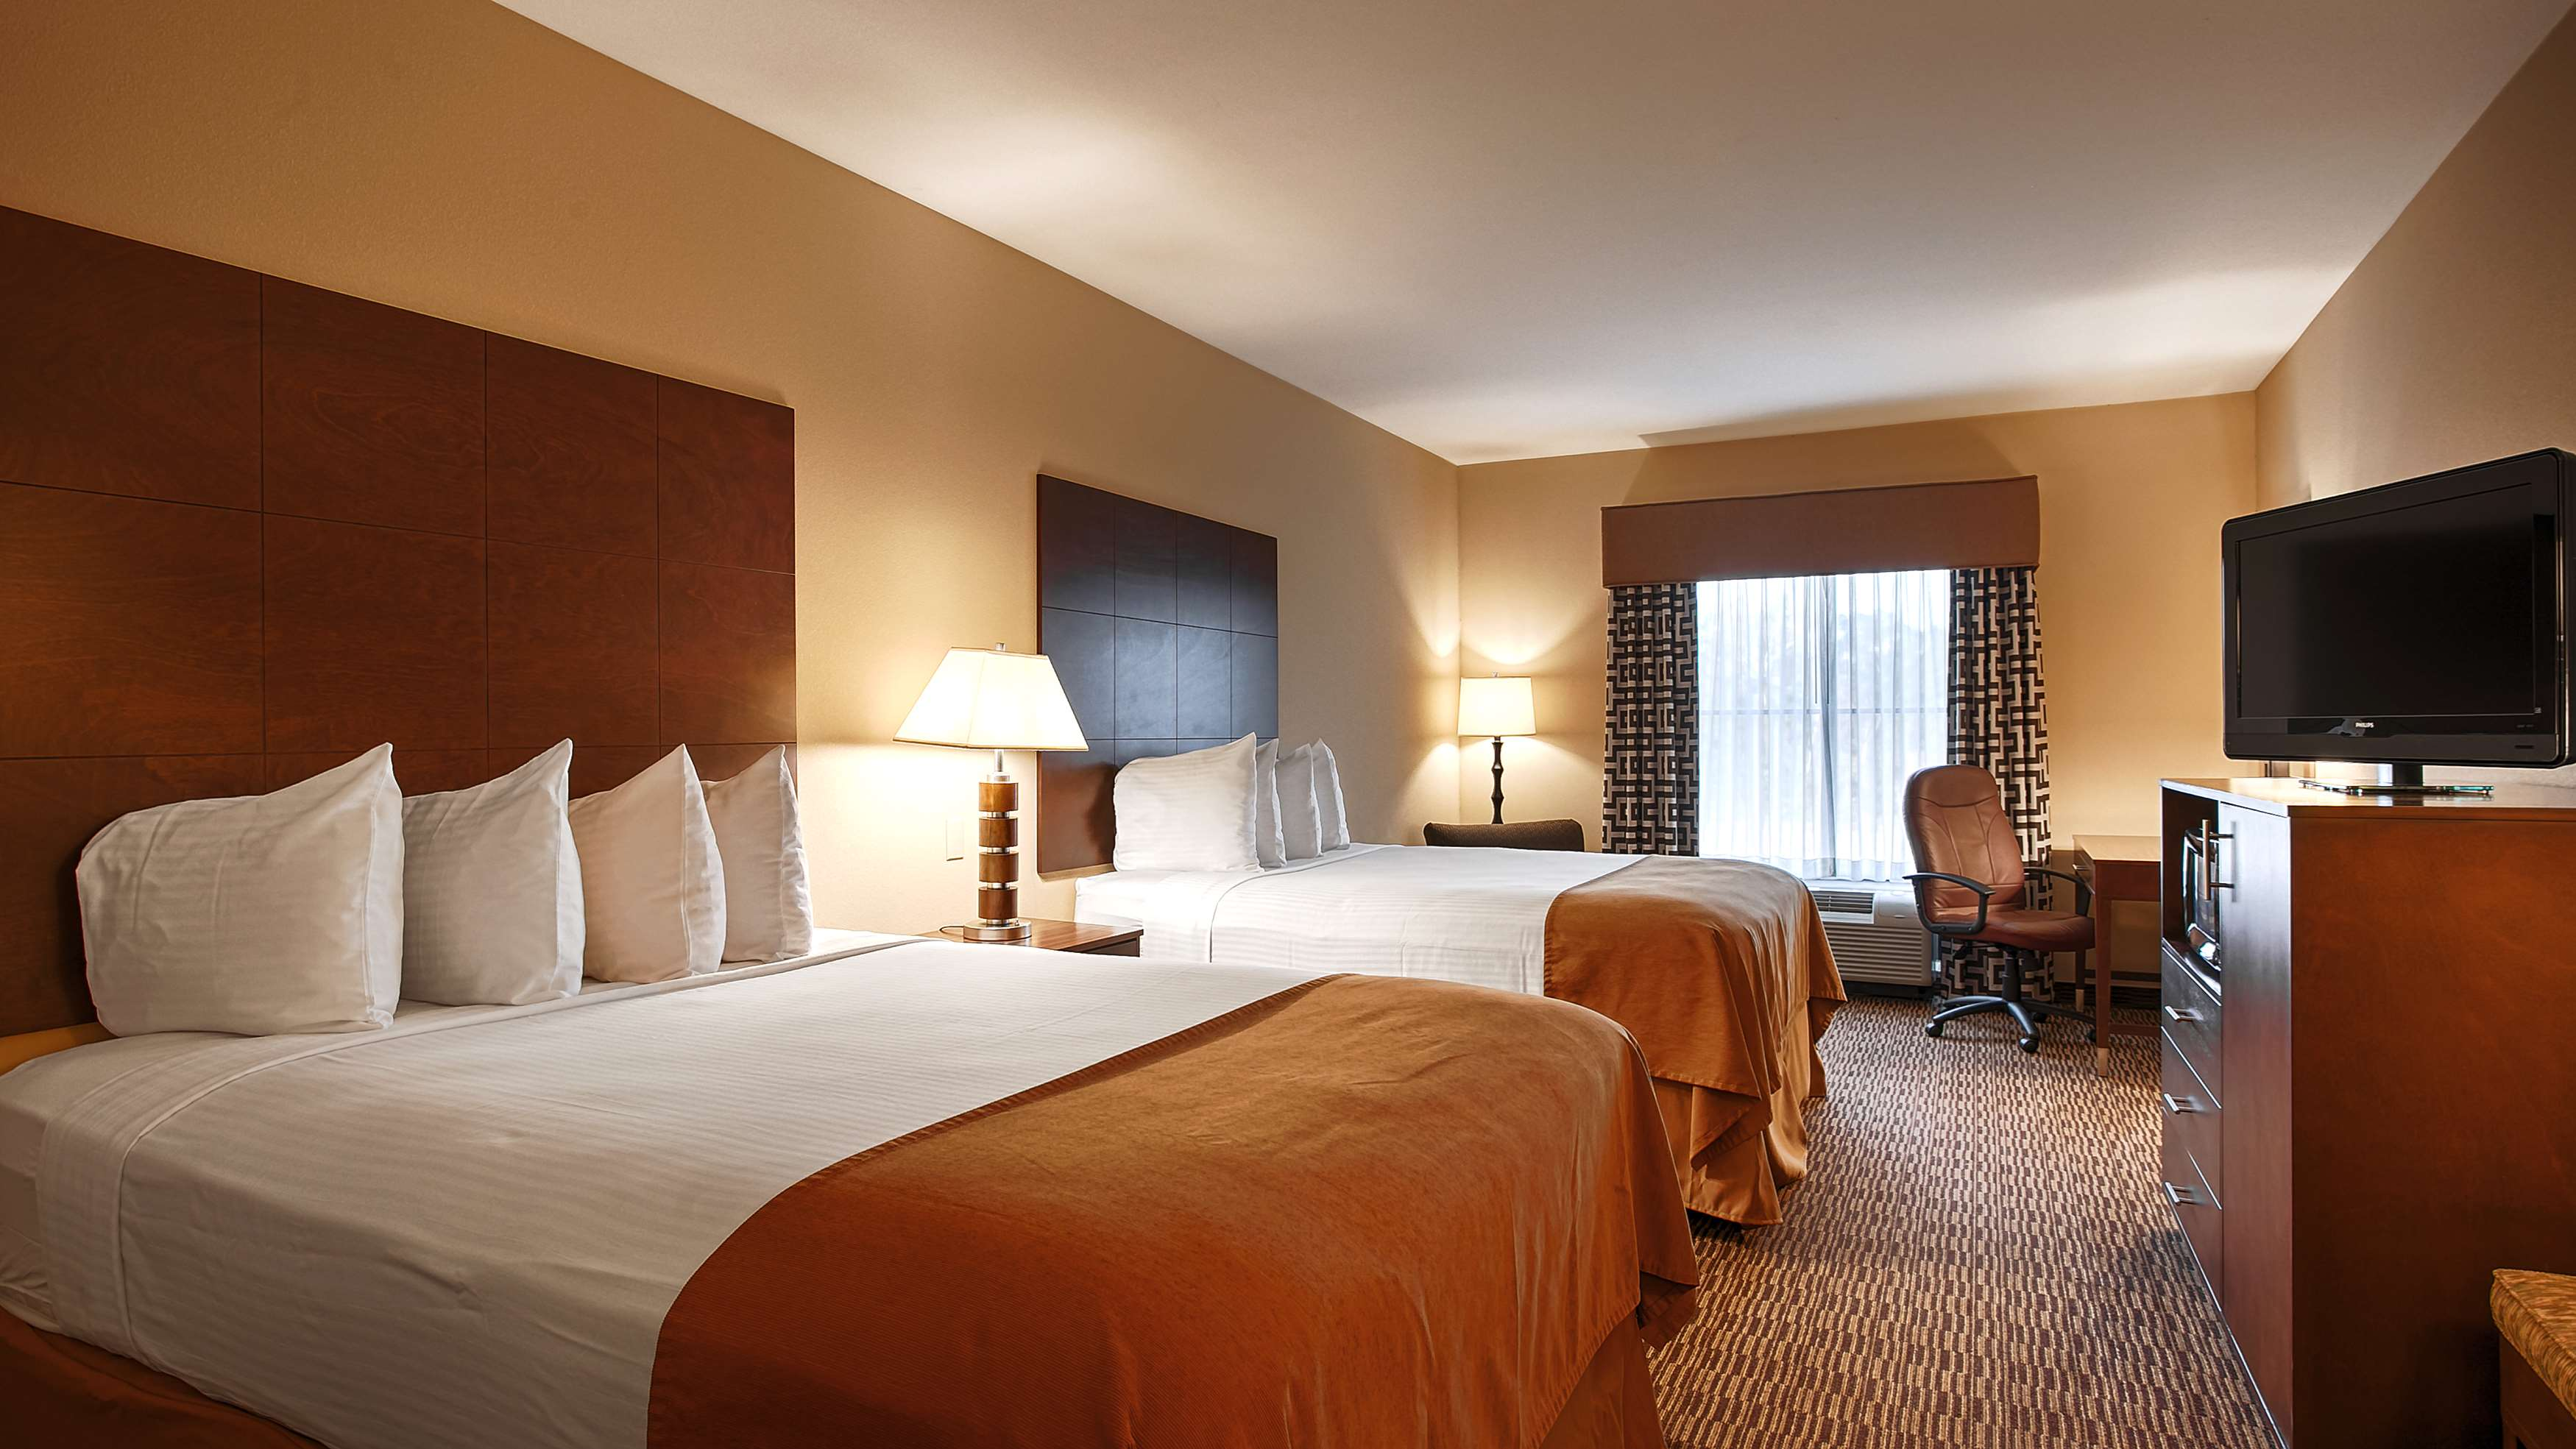 Best Western St. Francisville Hotel image 13